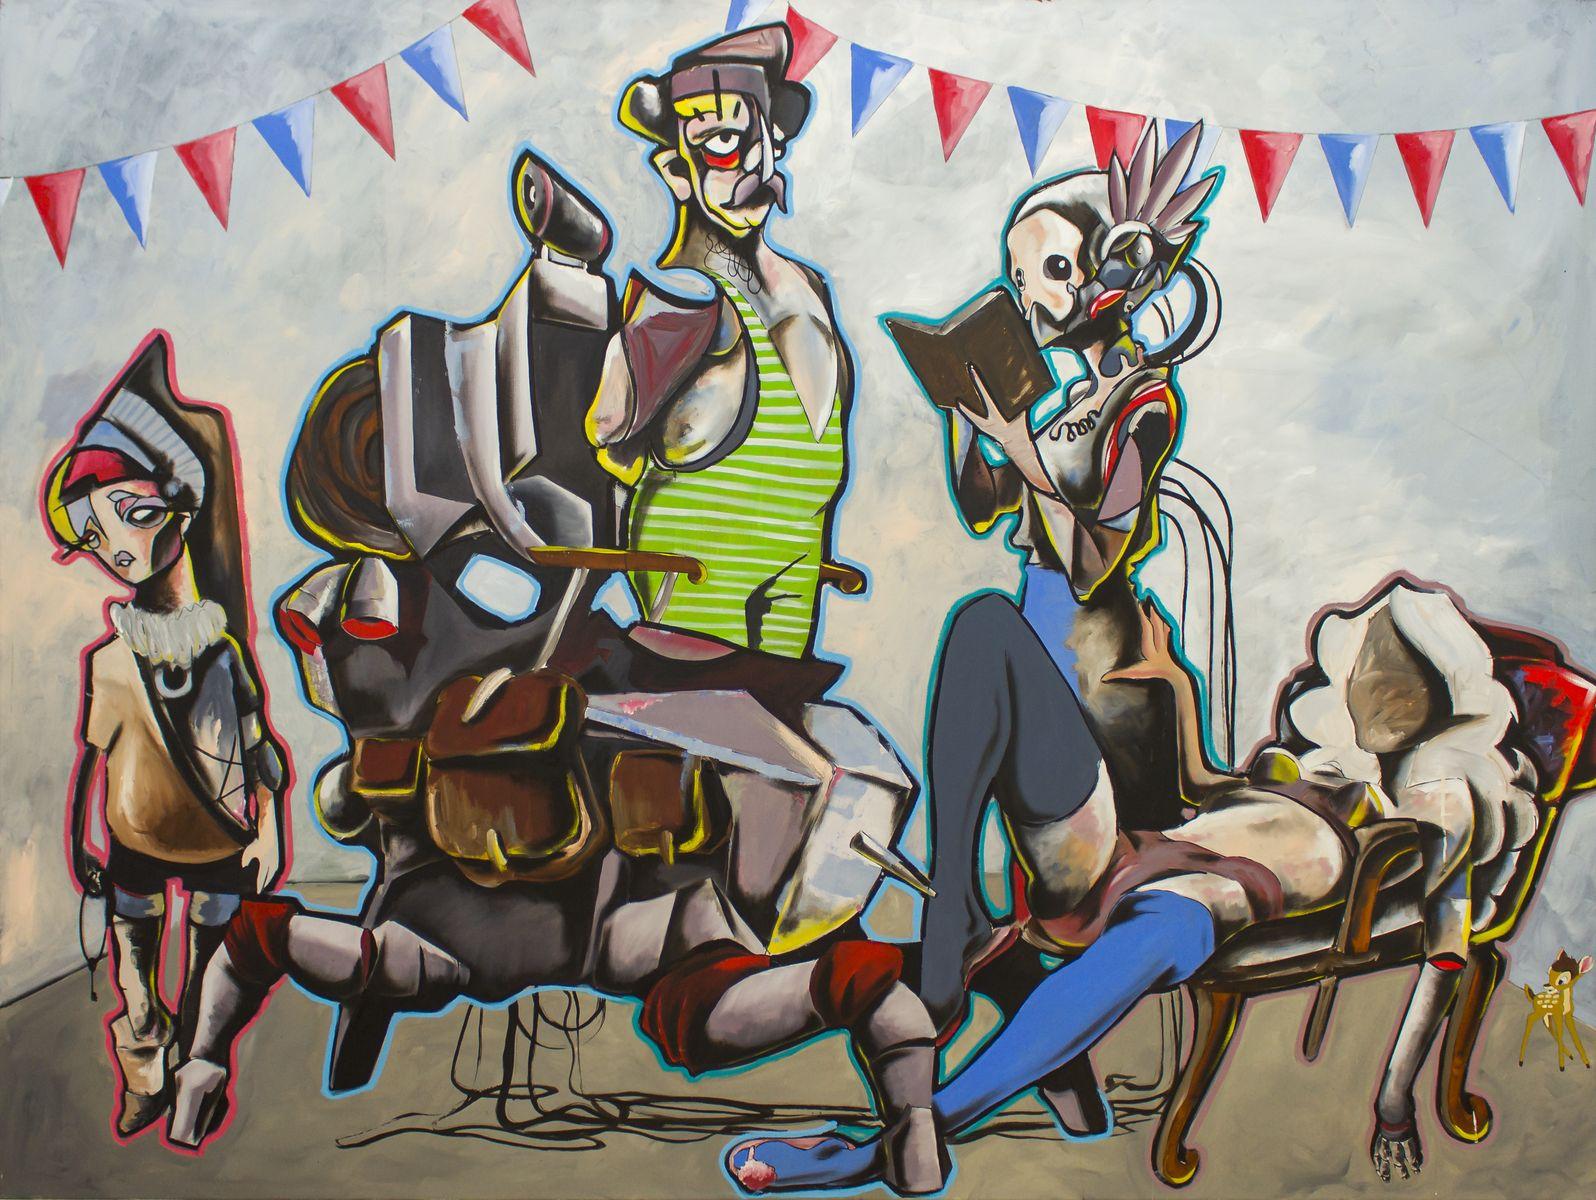 Daniel Harms | Babylon, Acryl auf Leinwand, 2019, 180 x 240 cm